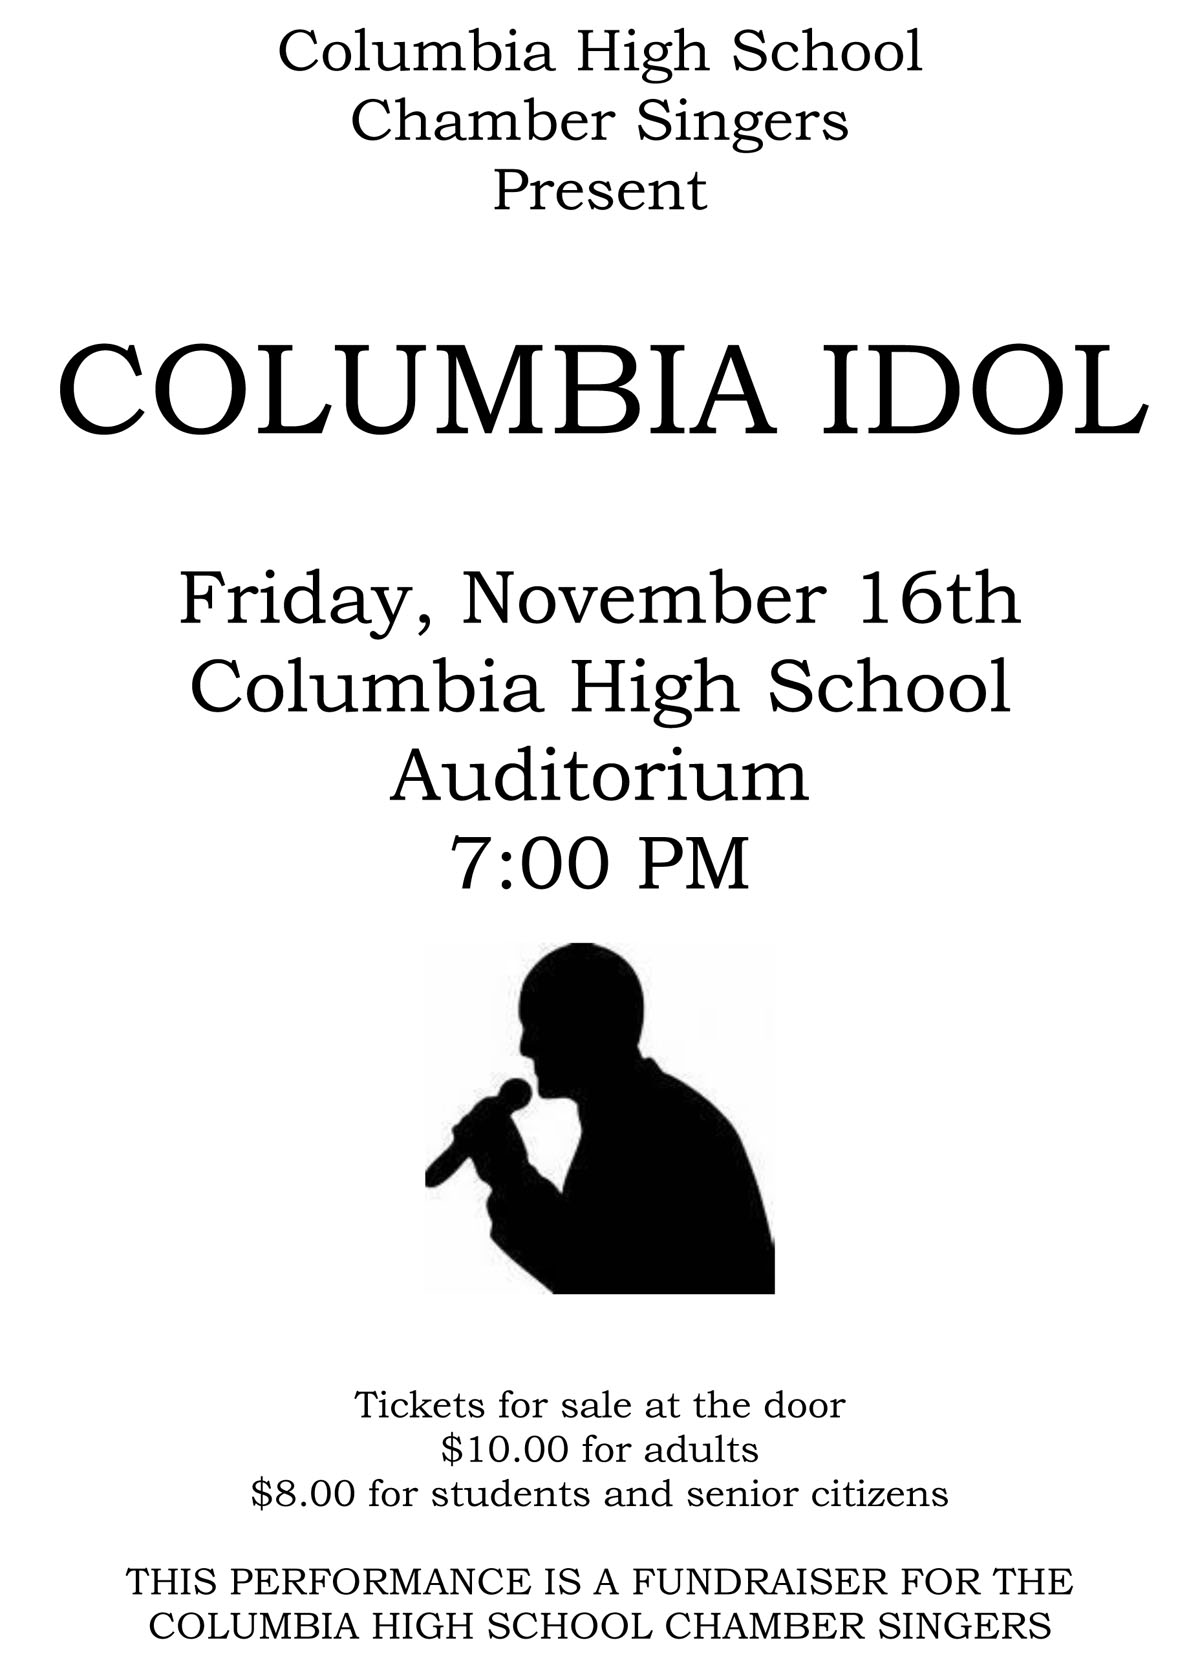 Columbia Idol poster